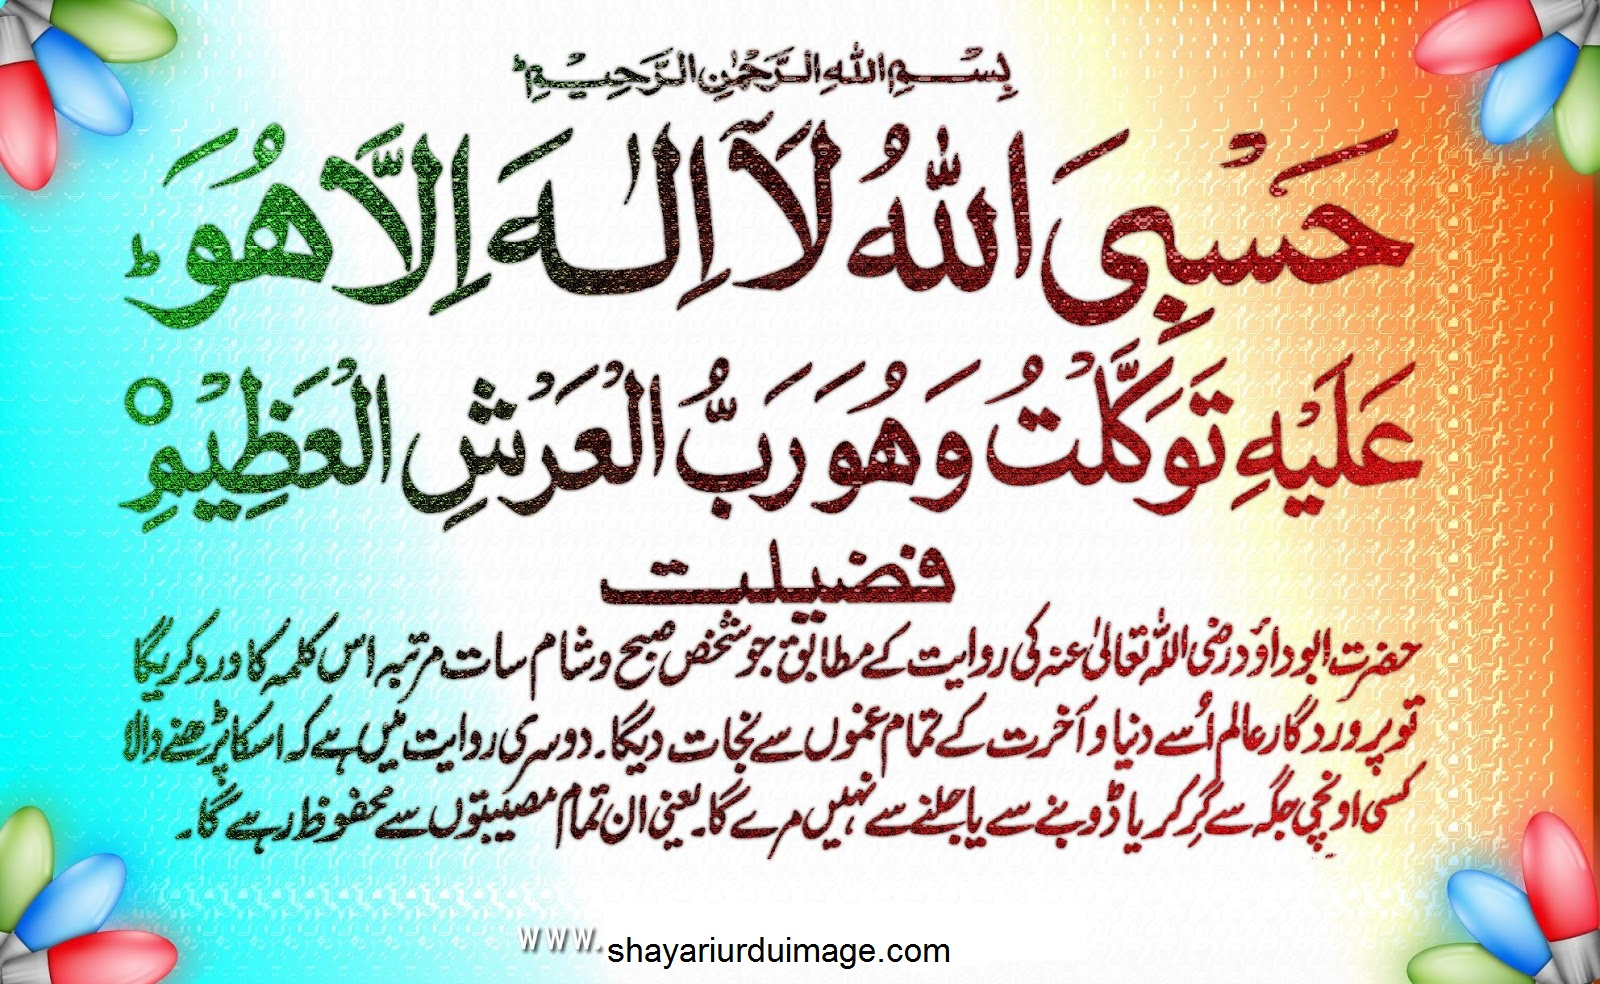 shayari urdu images urdu shayari with picture urdu shayari wallpaper love shayari urdu sad love